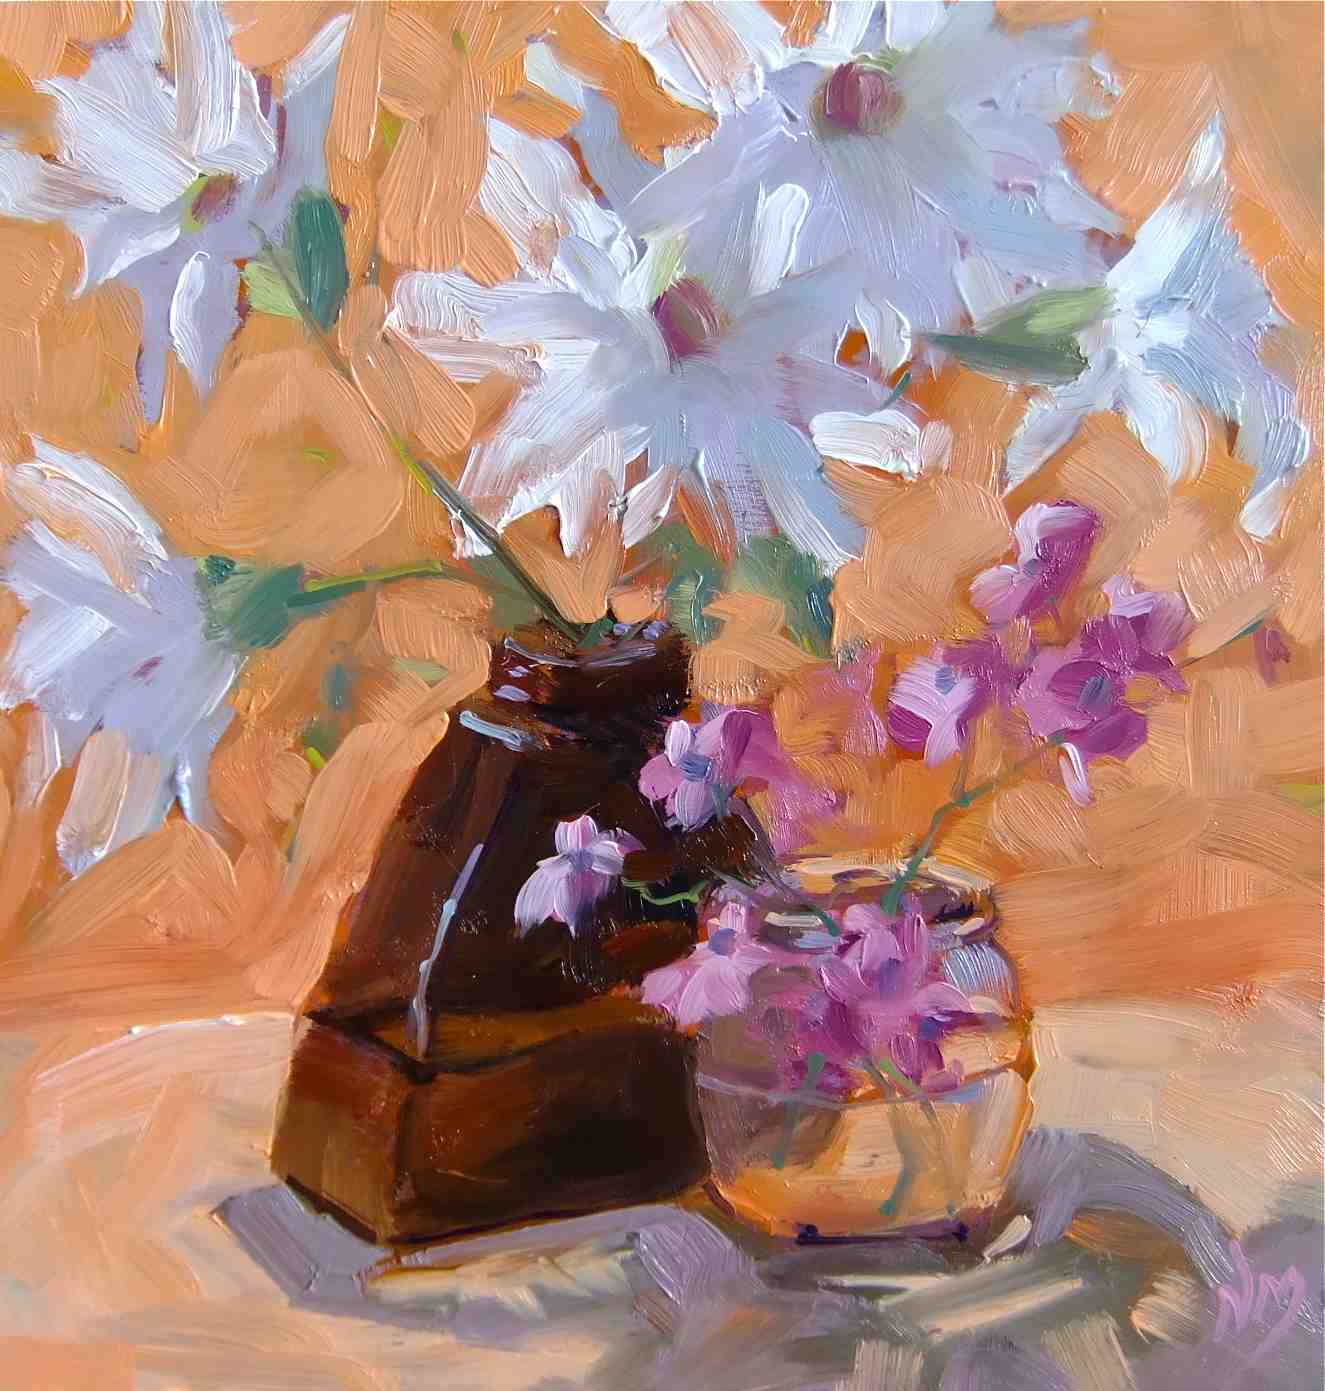 Painting: Artist: October 2011